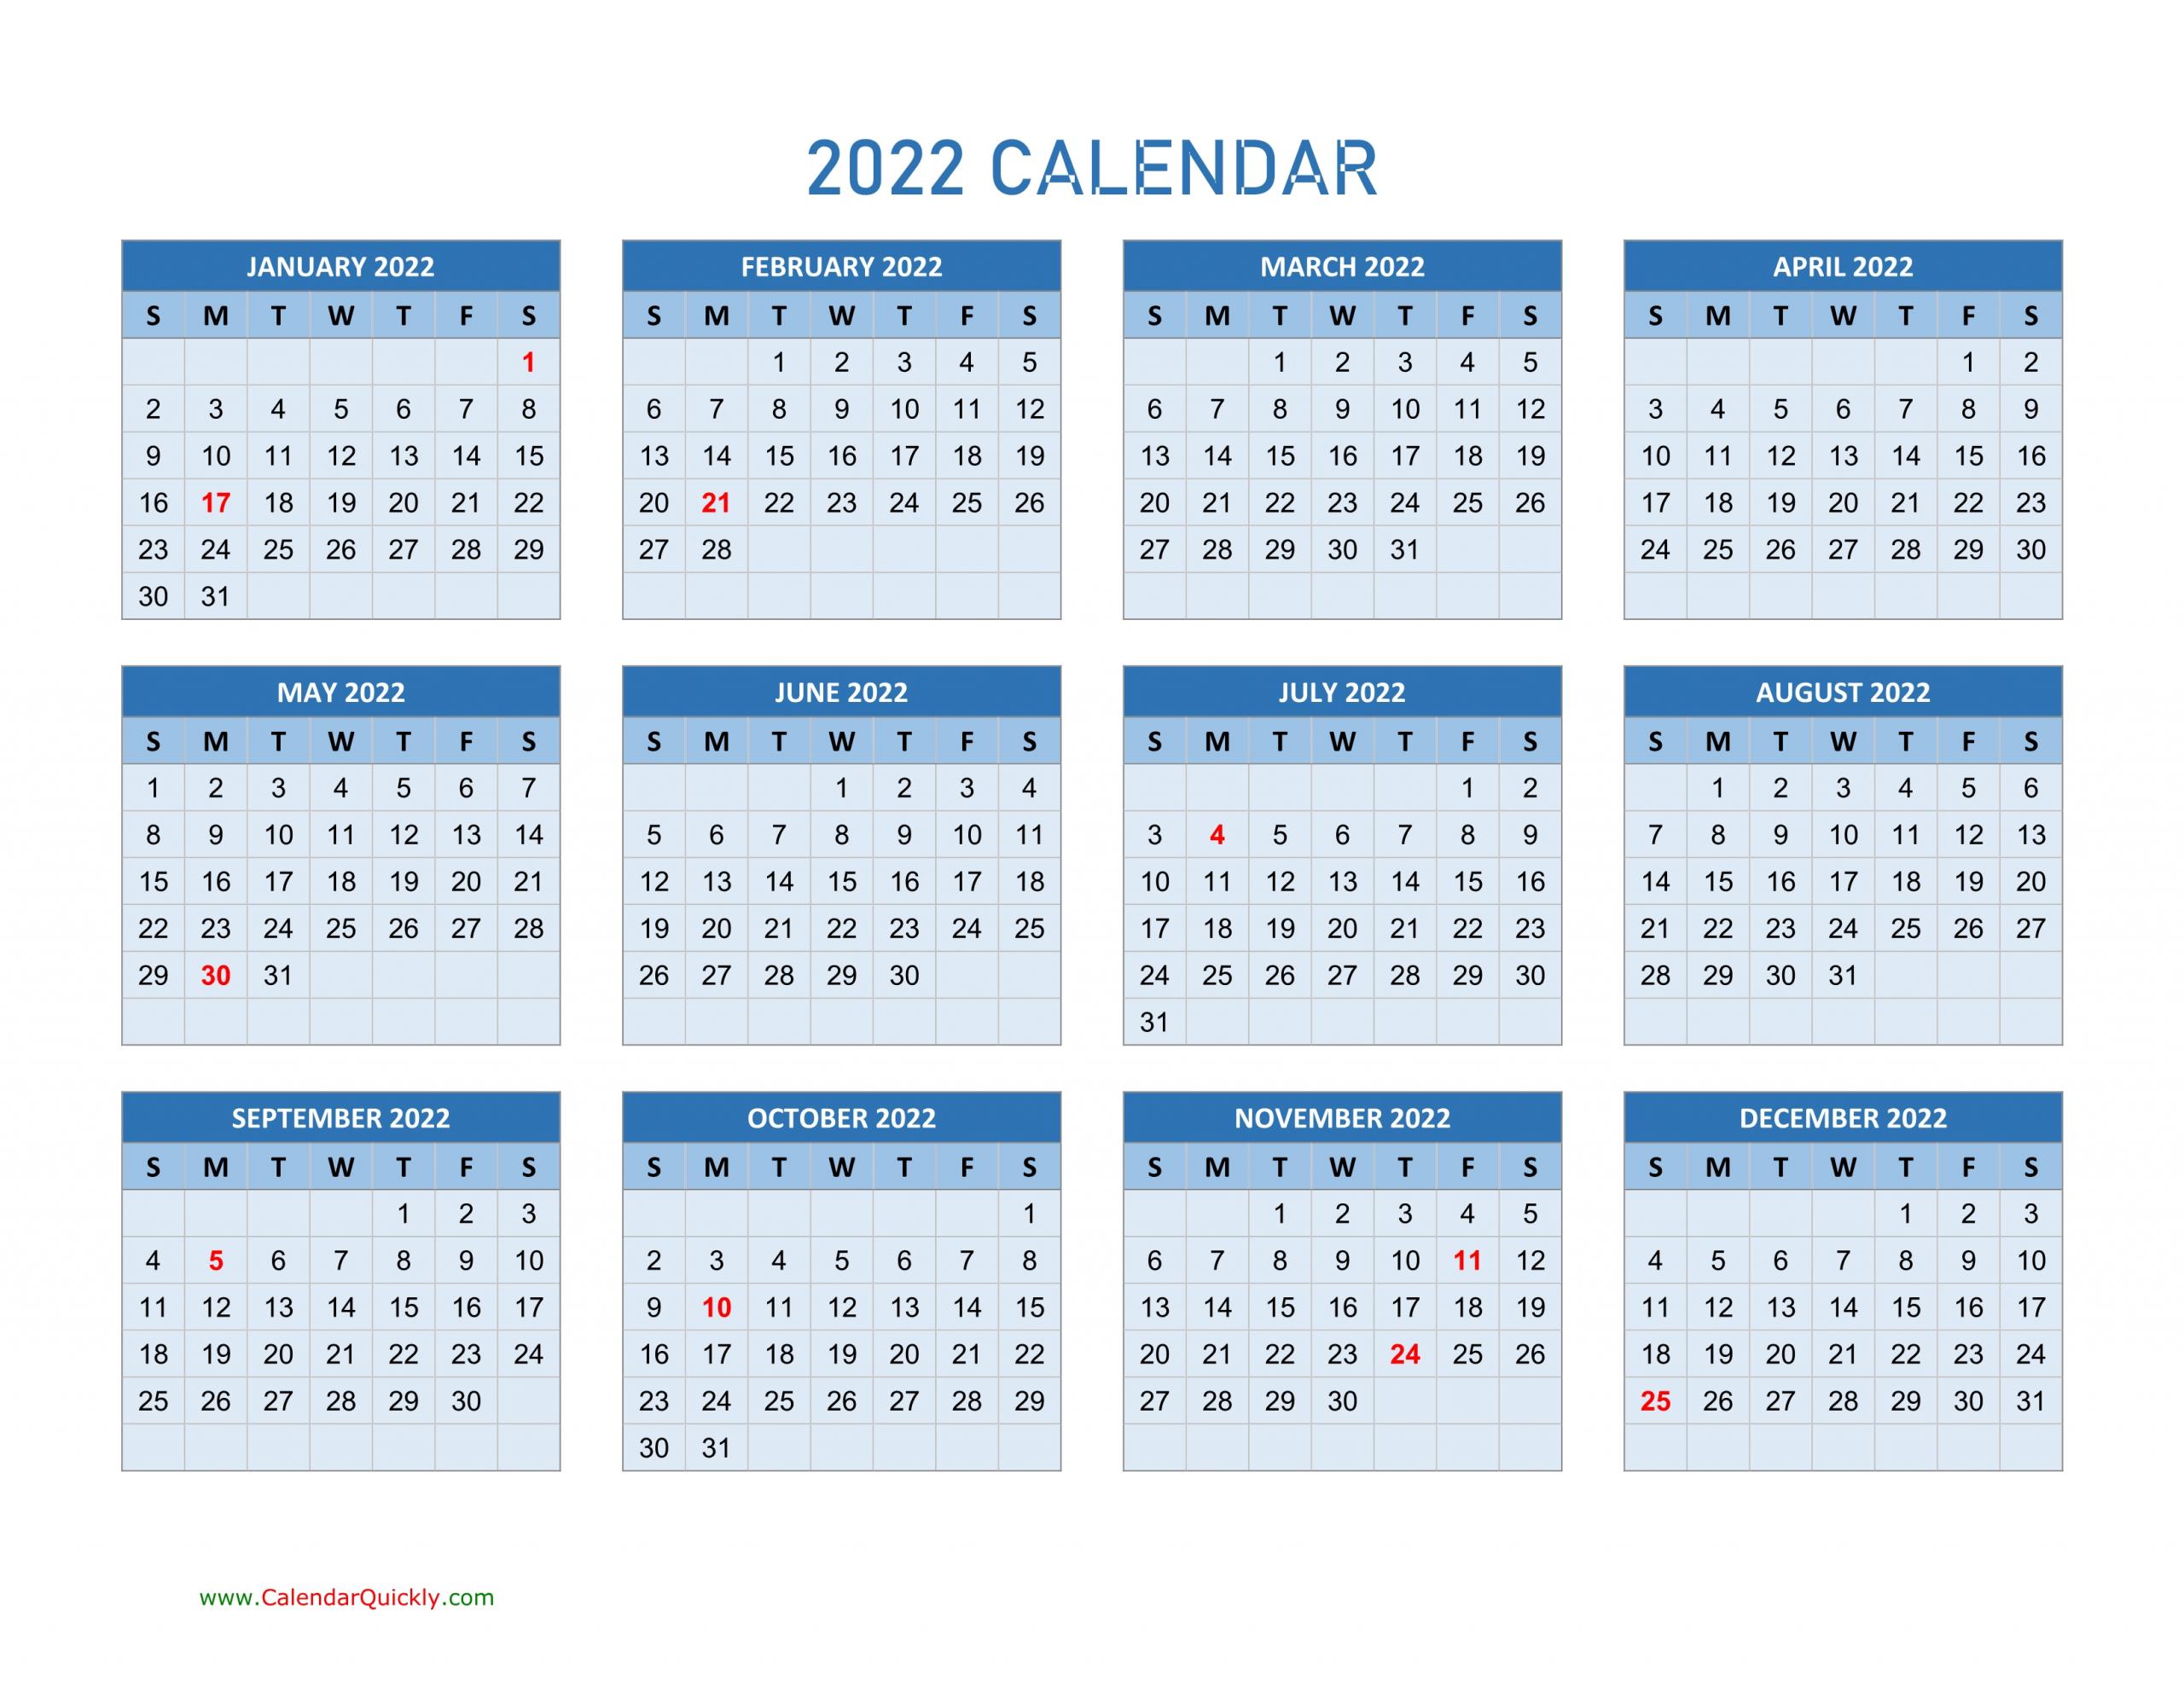 Year 2022 Calendars   Calendar Quickly